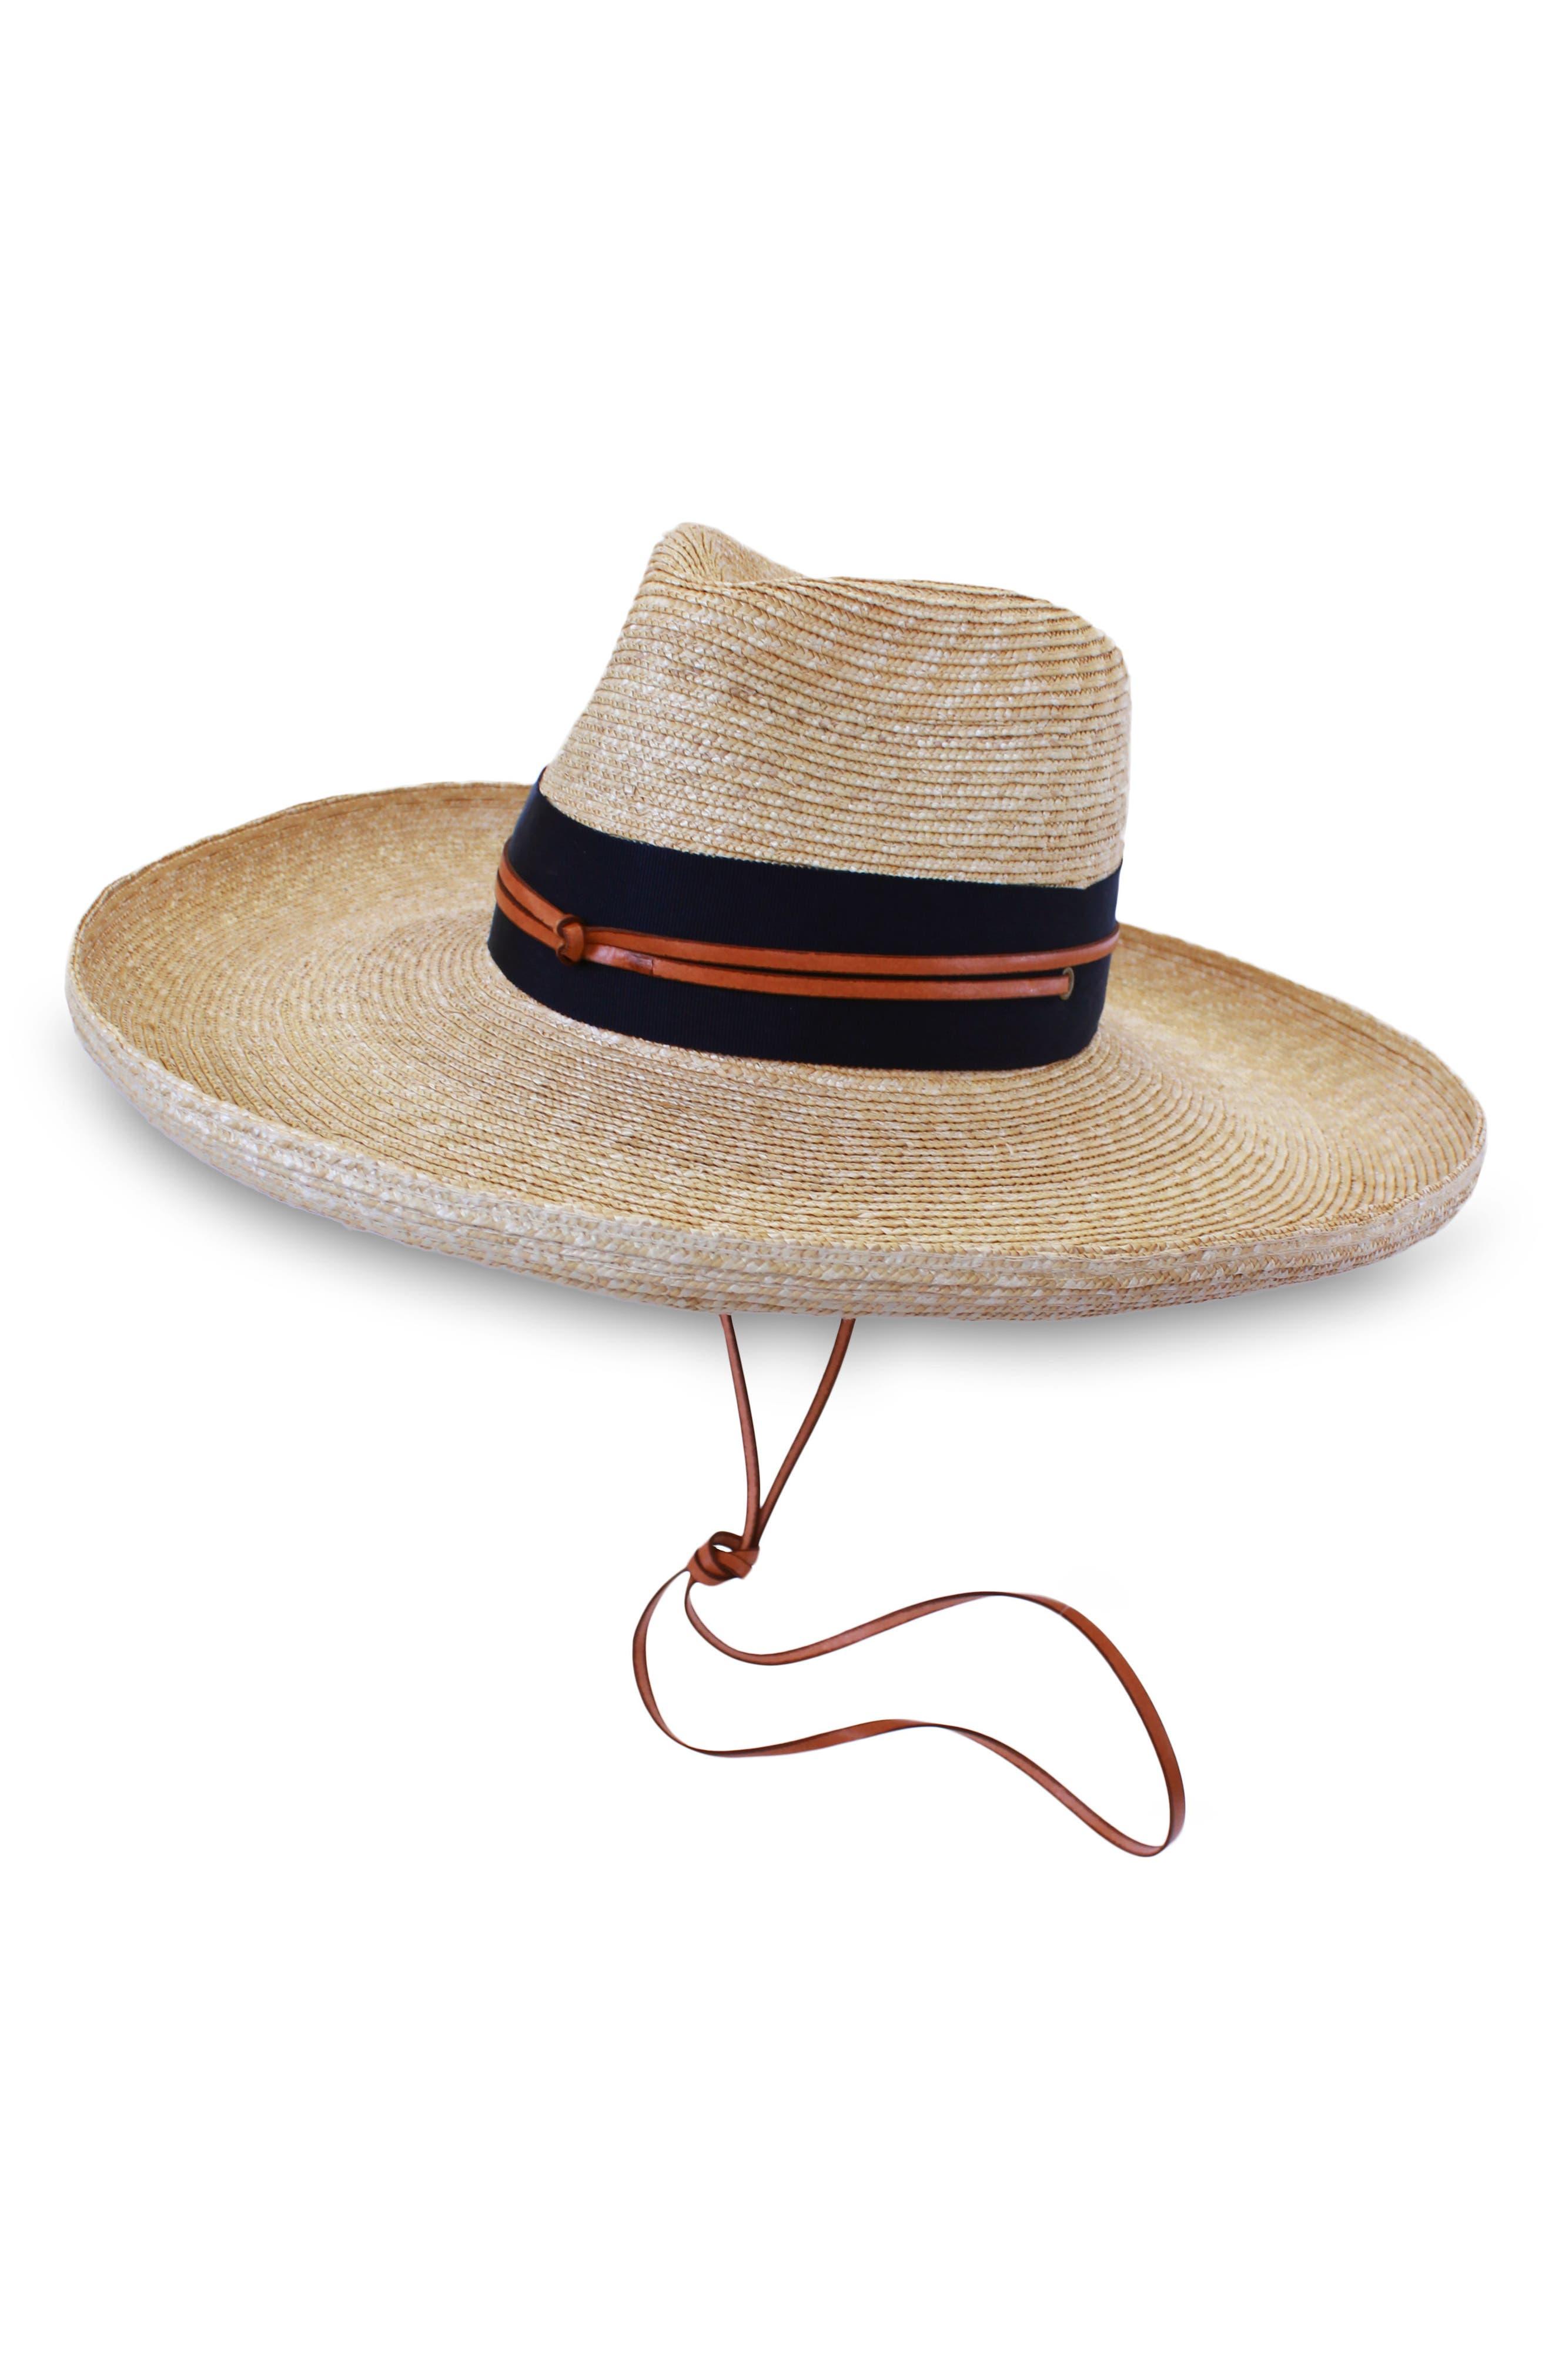 Comargo Raffia Hat,                         Main,                         color, NATURAL/ NAVY